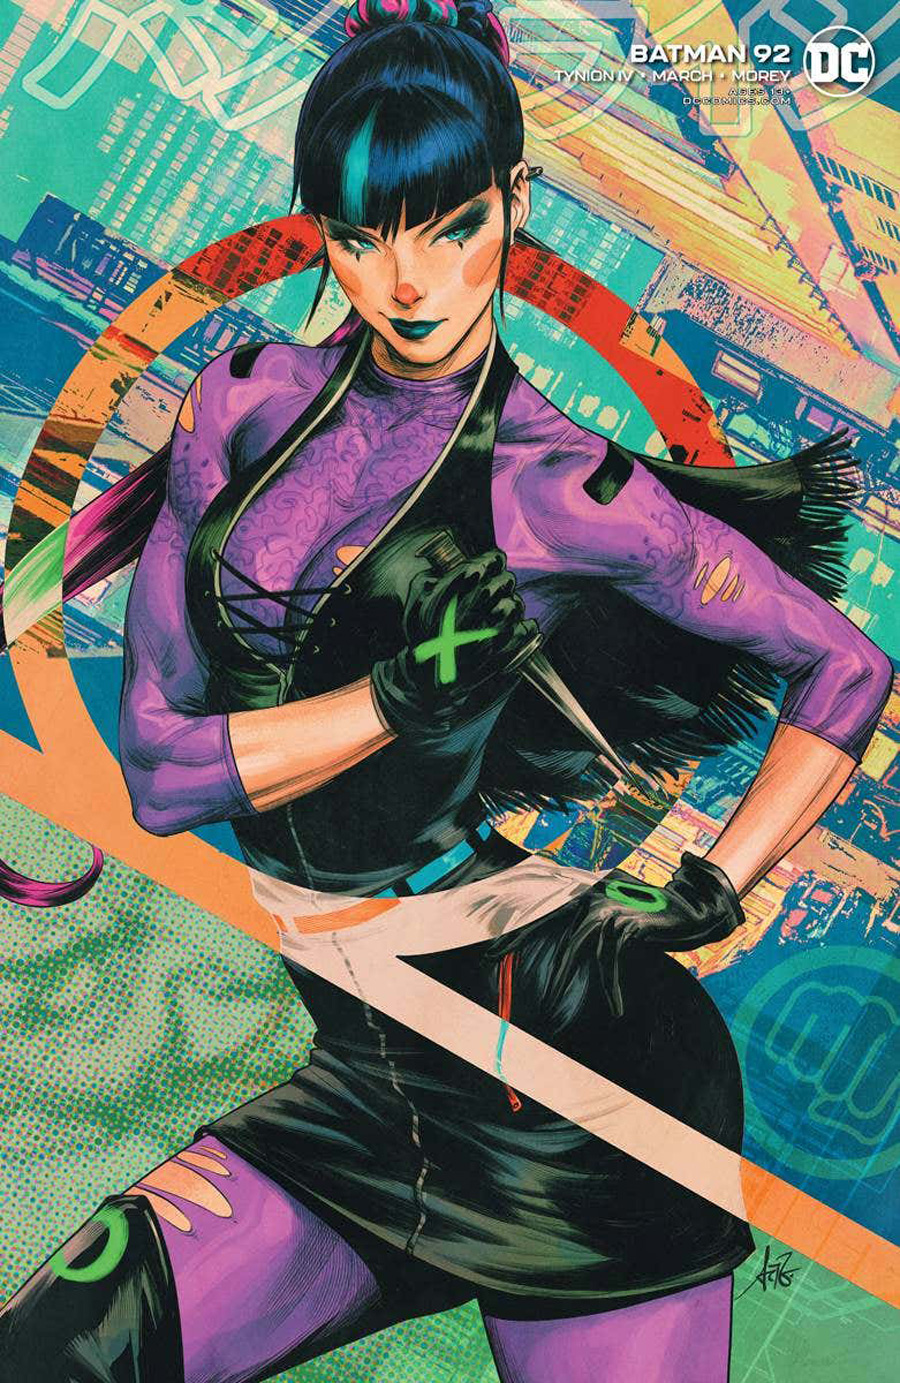 Batman #92 (2020)